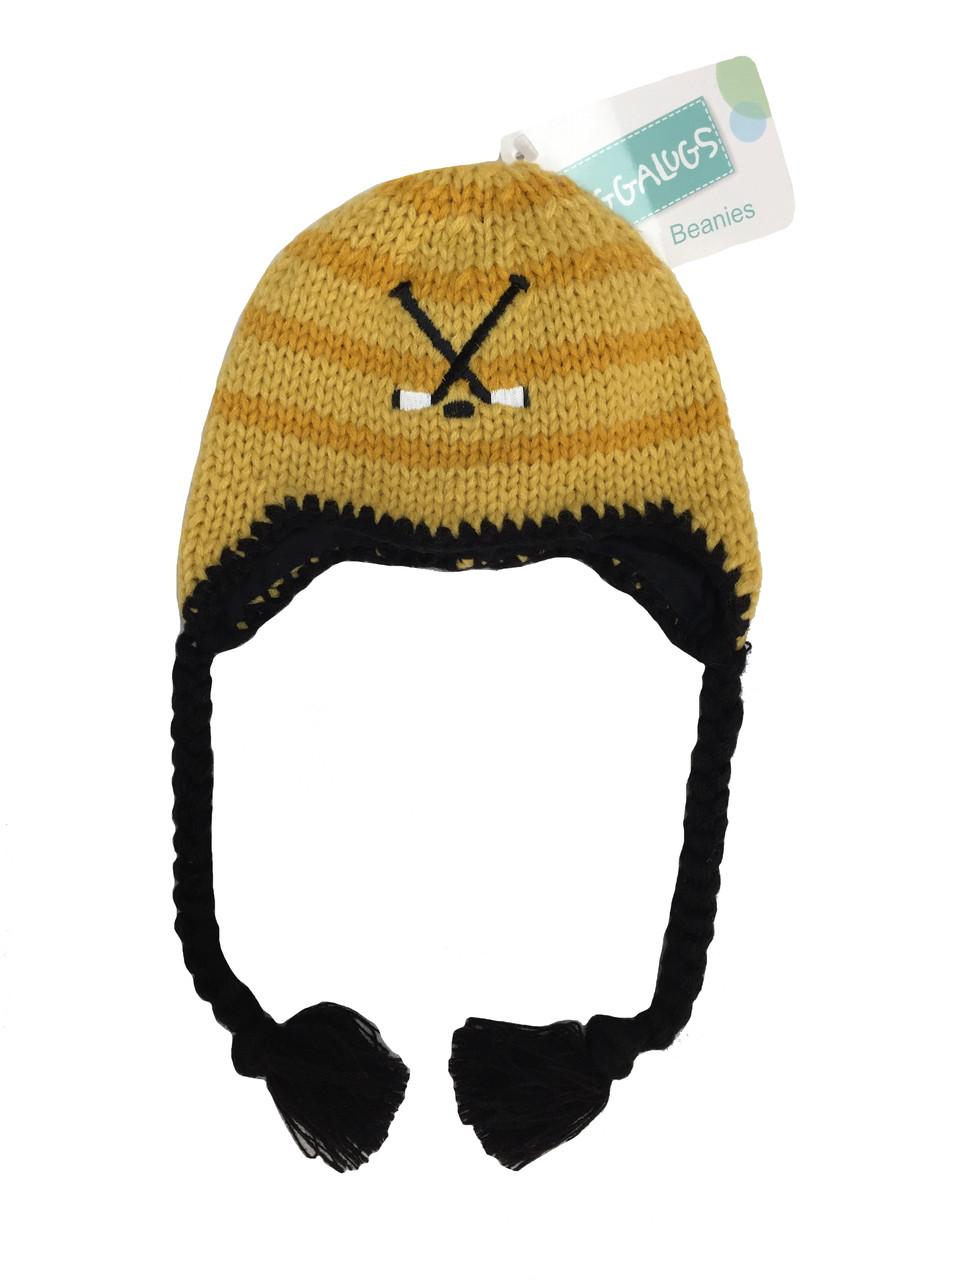 Huggalugs Boys Beanie Hats  5261a166ab3